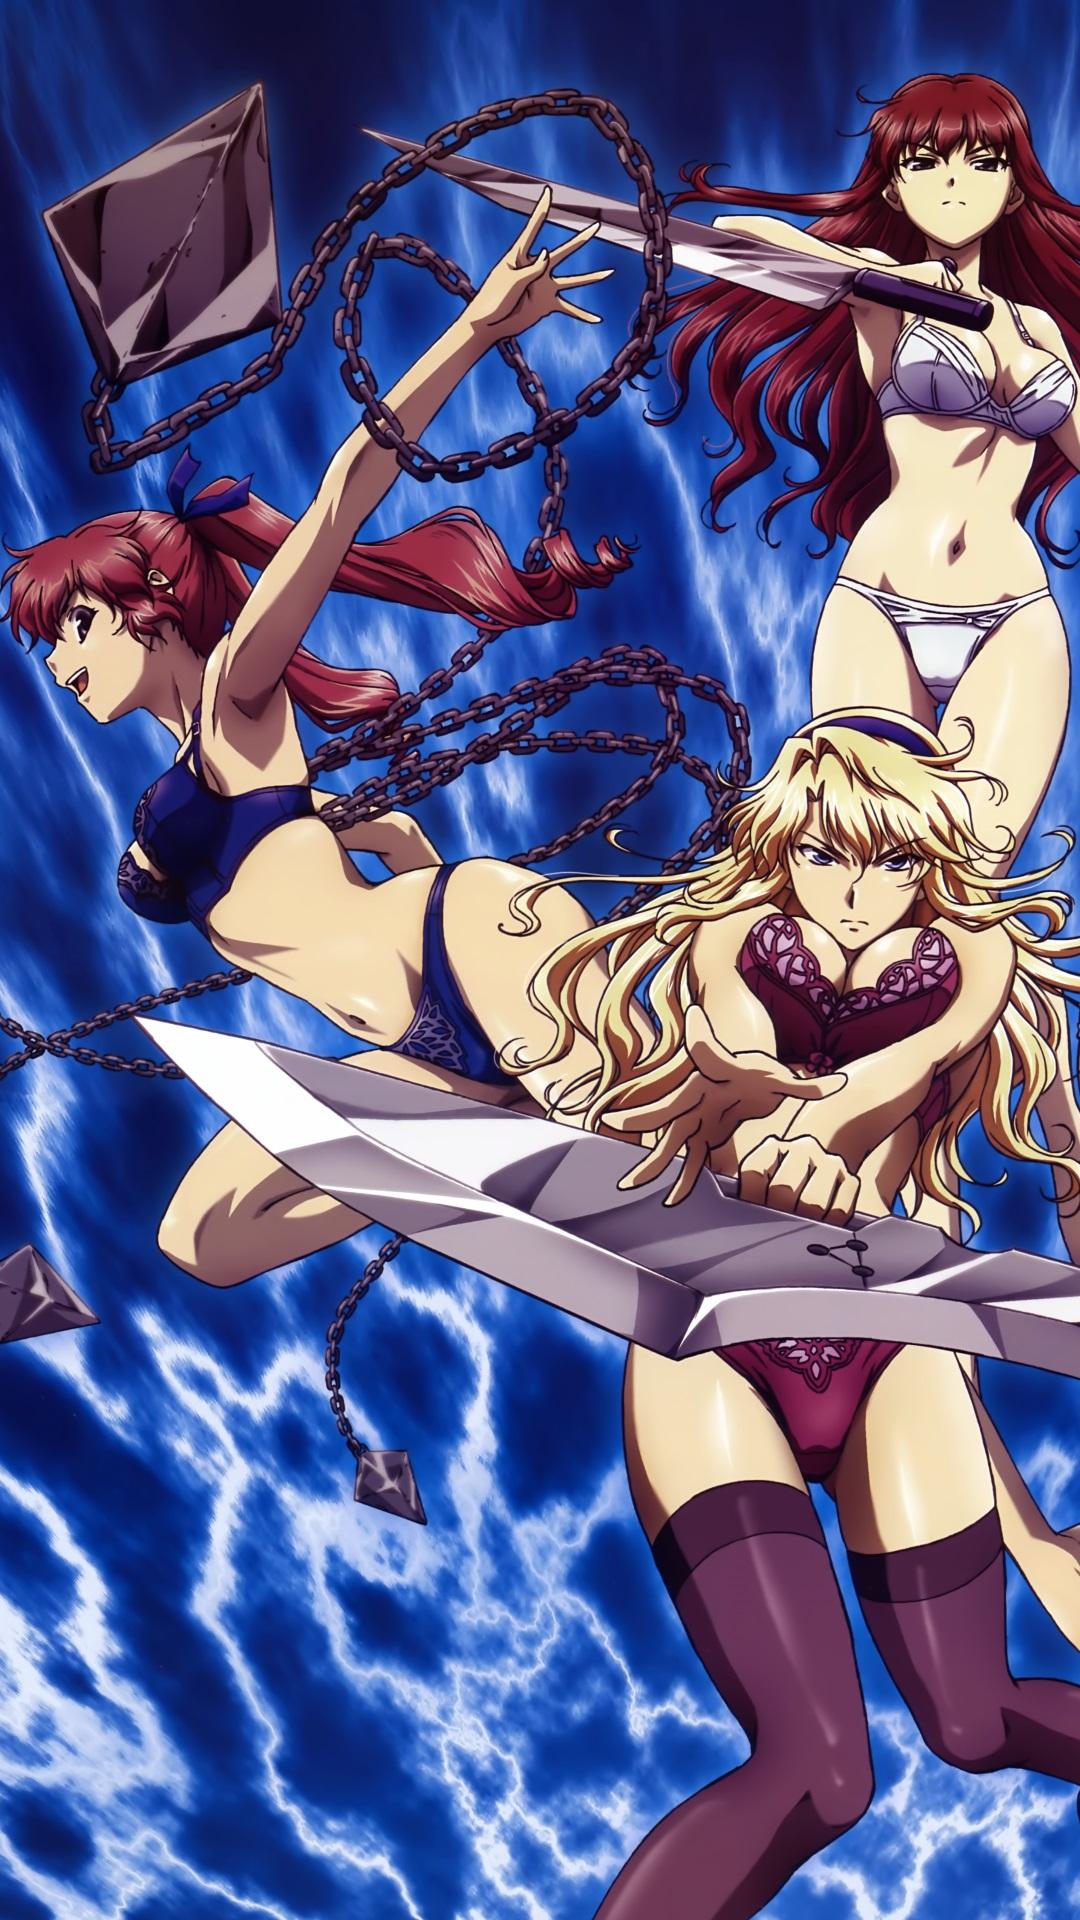 Image Result For Freezing Anime Wallpaper X